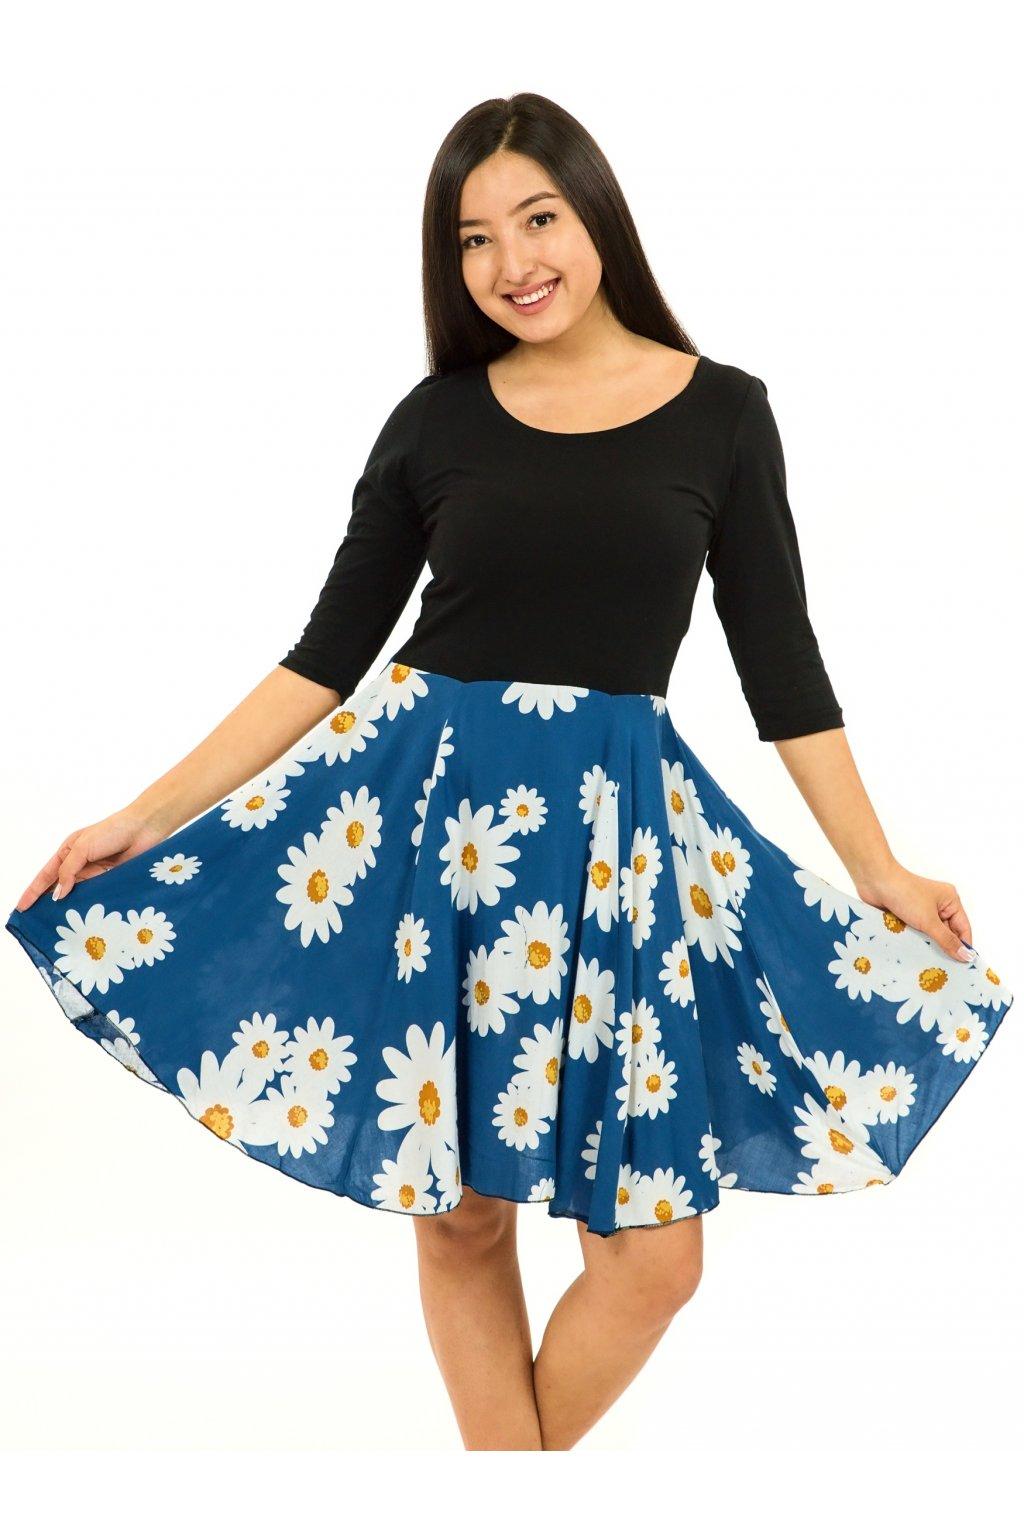 Šaty s 3/4 rukávem Kopretina - modrá